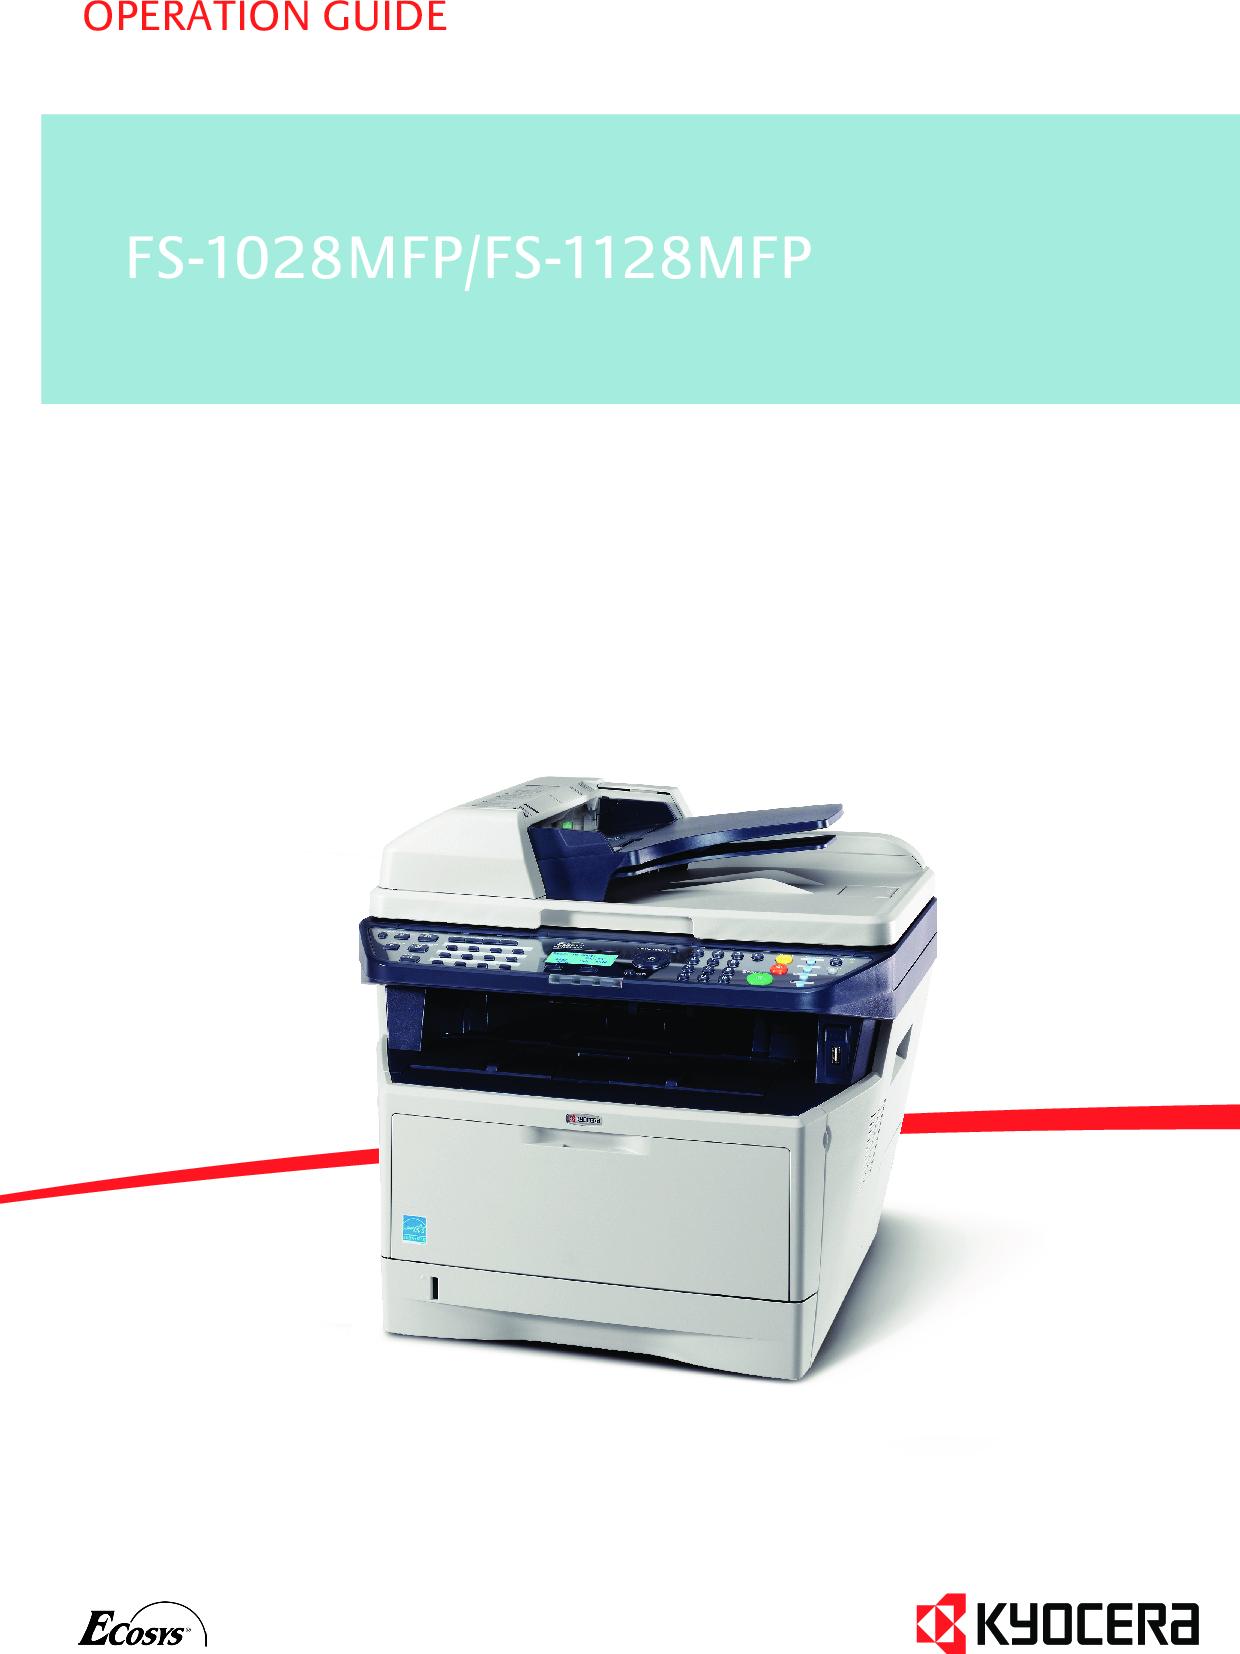 Kyocera FS 1128MFP 1028MFP/FS User Manual To The A2cb7774 1acb 4915